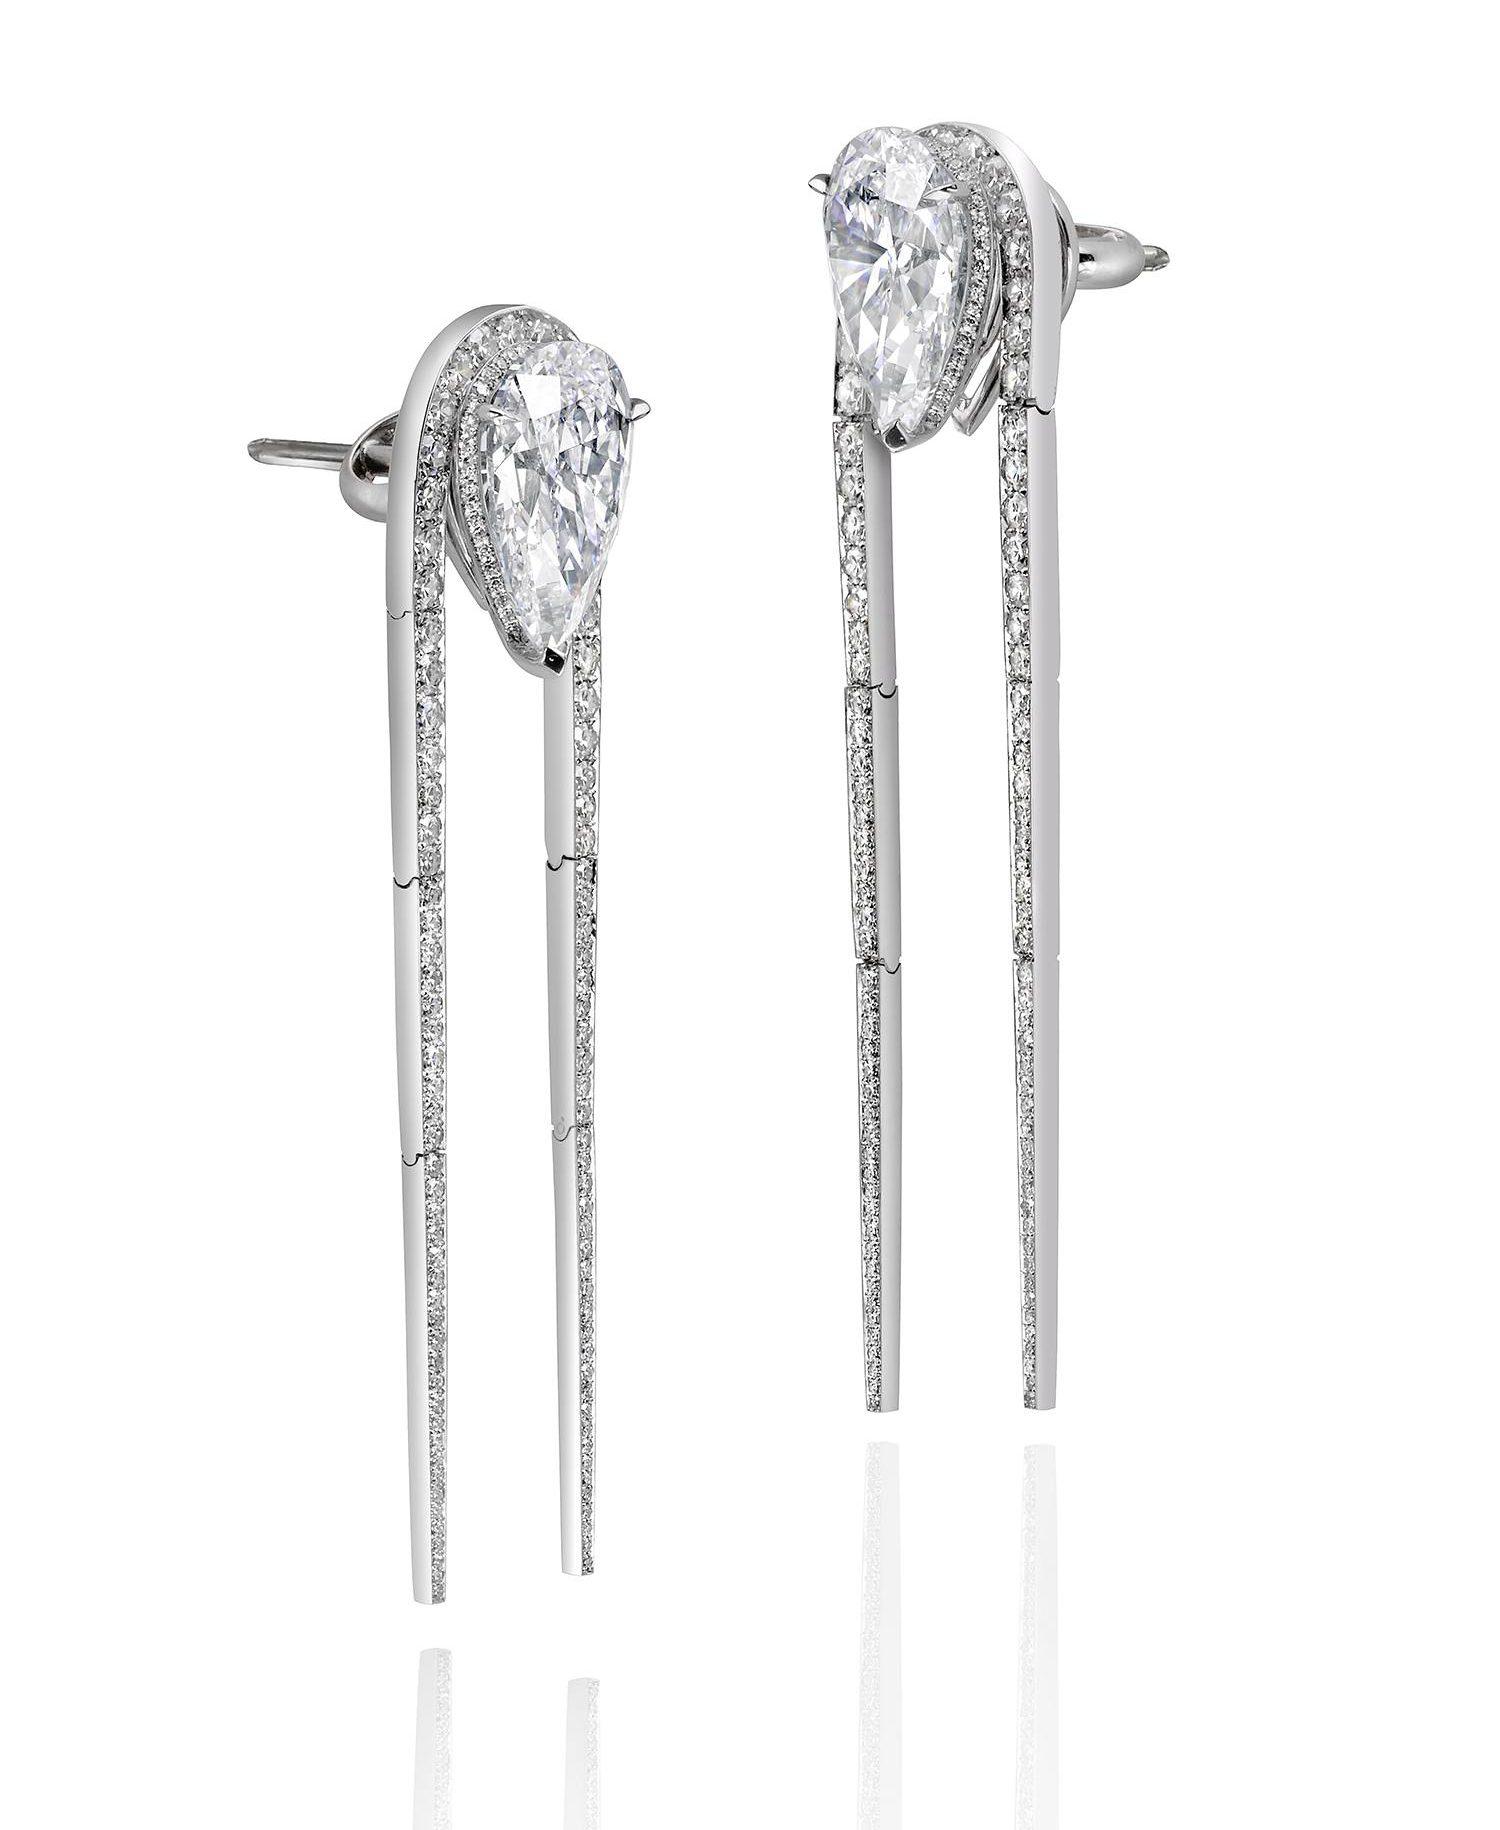 Hong Kong Jeweler Nicholas Lieou Is Transforming Diamonds Into Dazzling Works Of Art Galerie